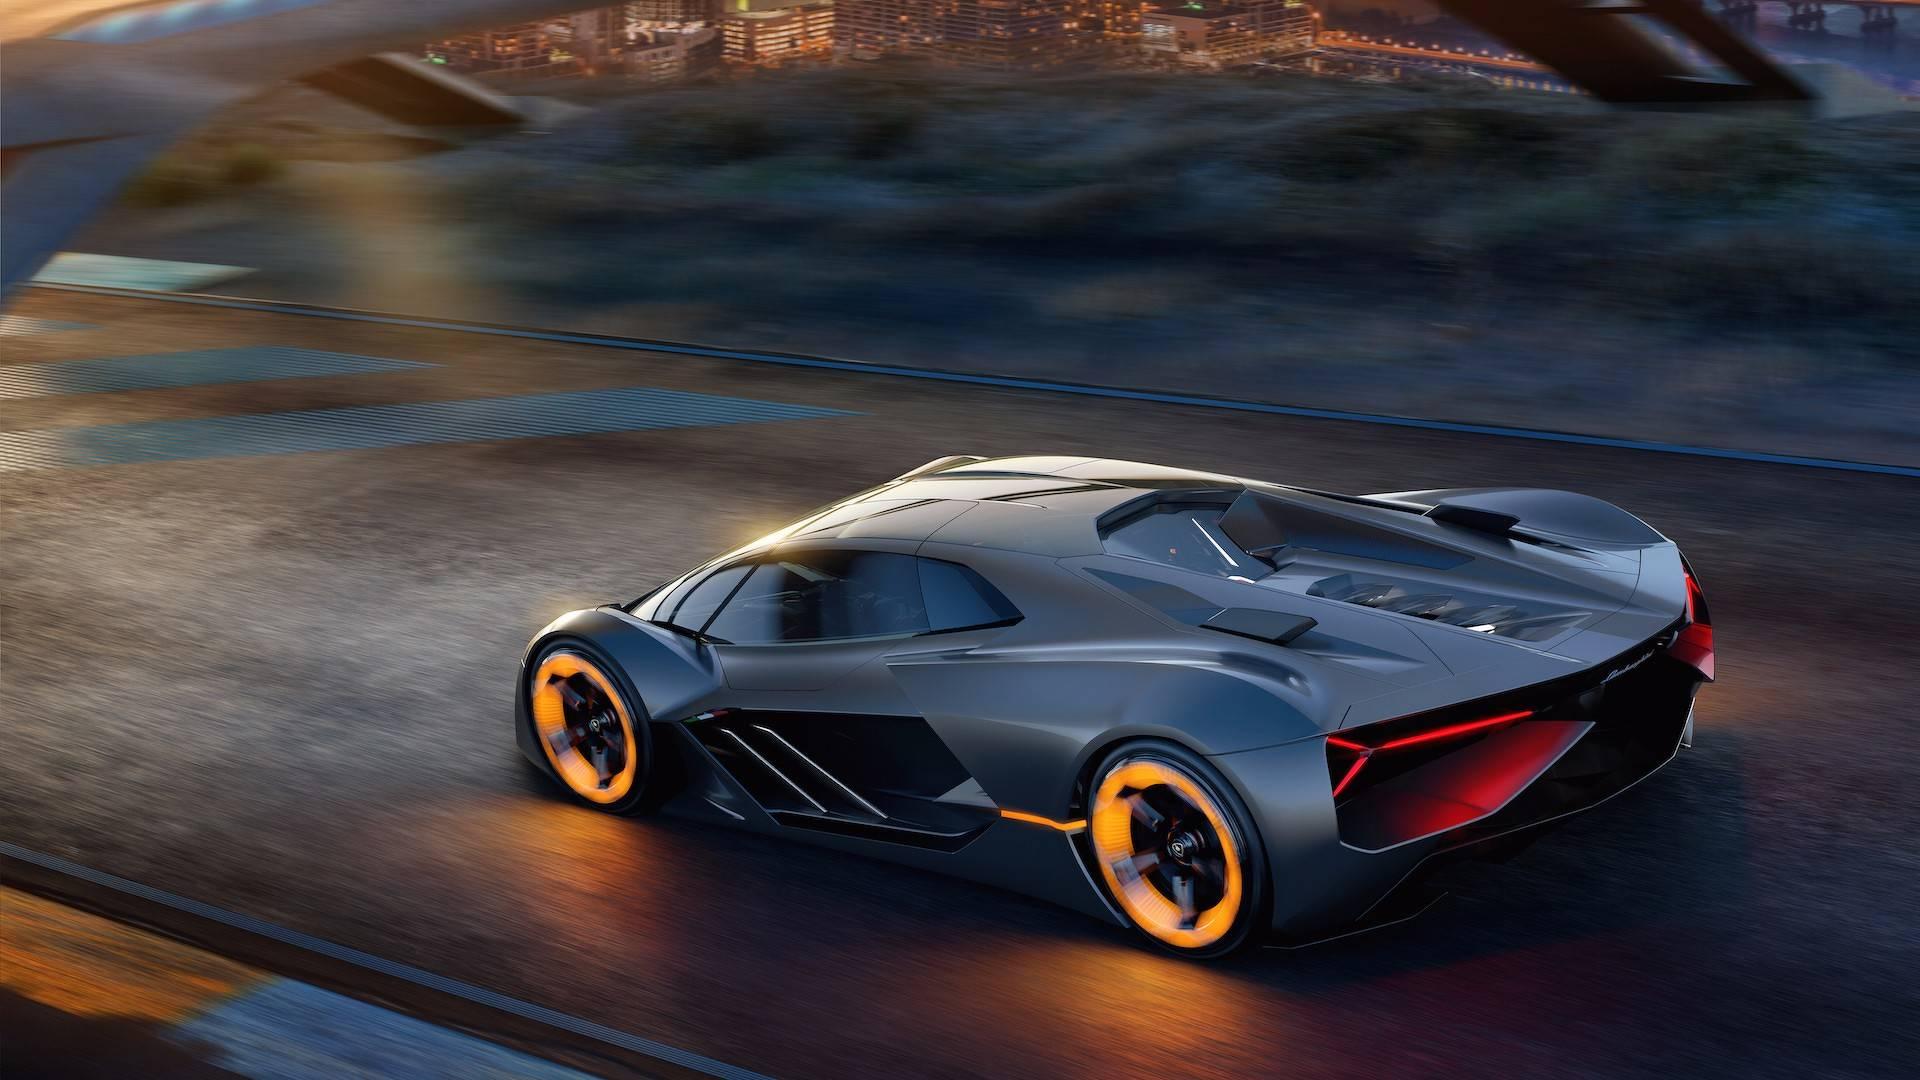 Lamborghini Terzo Millennio Nissan Gt R Porsche 911 Gt2 Rs This Week S Top Photos